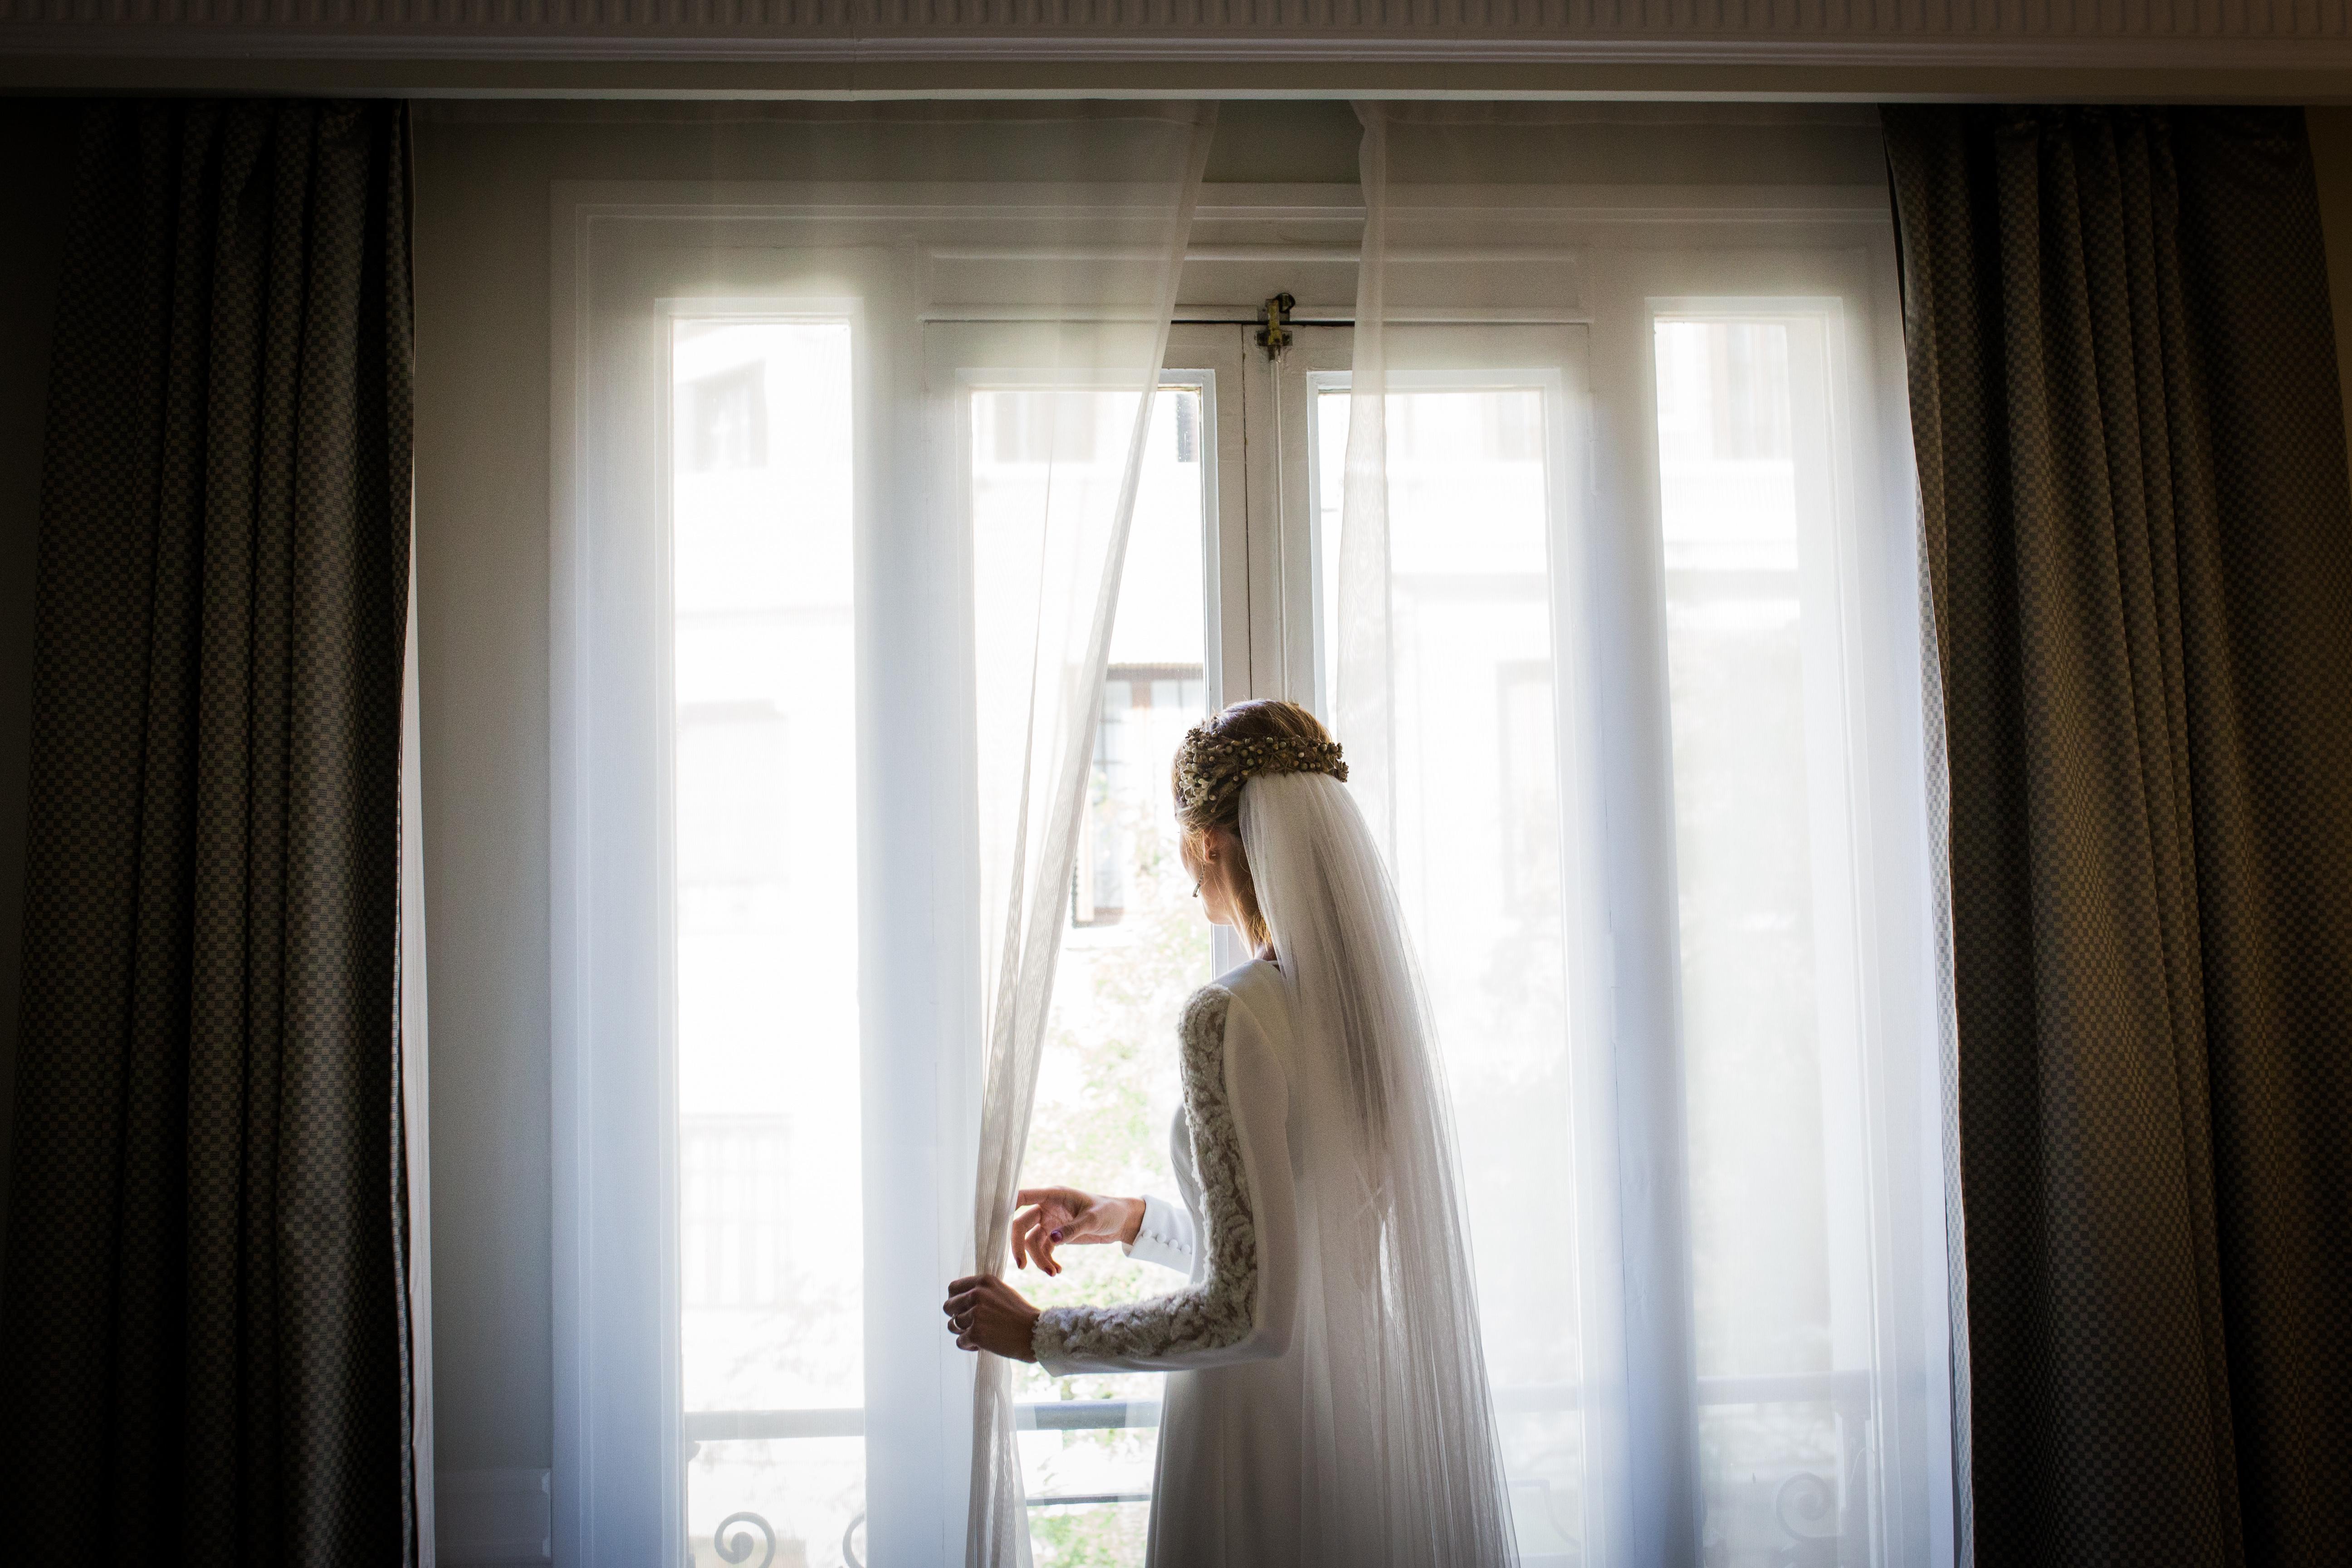 mandarina weddig, fotografos de boda, fotografo boda soria, fotografo boda barcelona, fotografo boda Madrid, fotografo boda lerida, fotografo boda Huesca_07